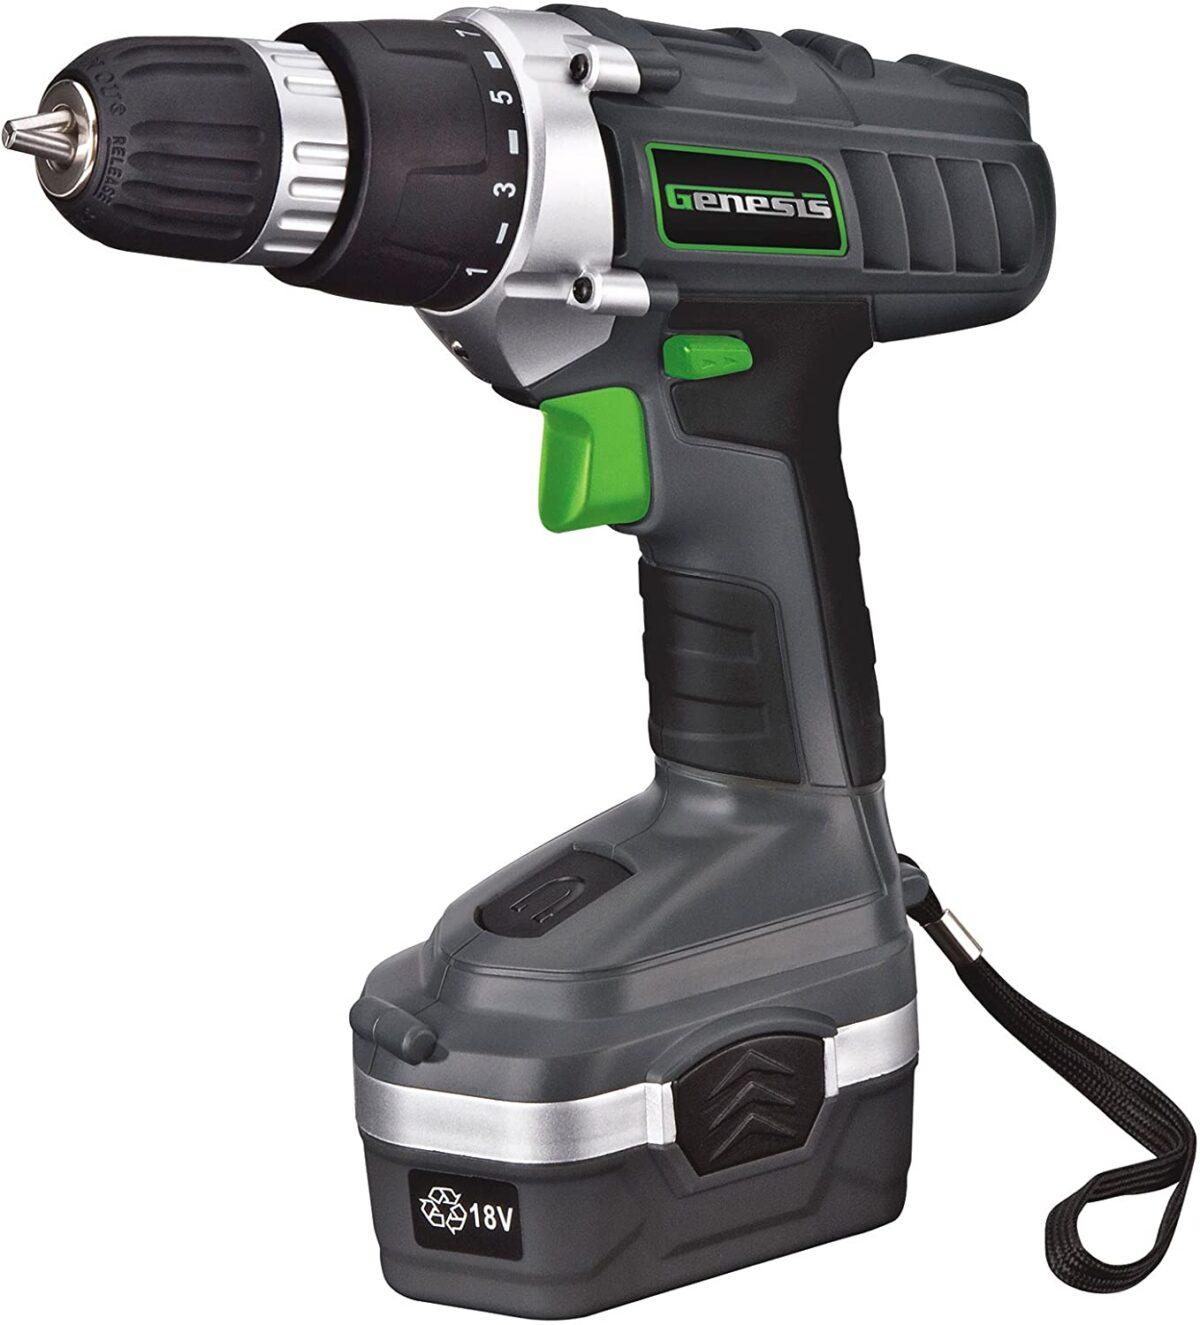 Genesis 18 Volt Drill